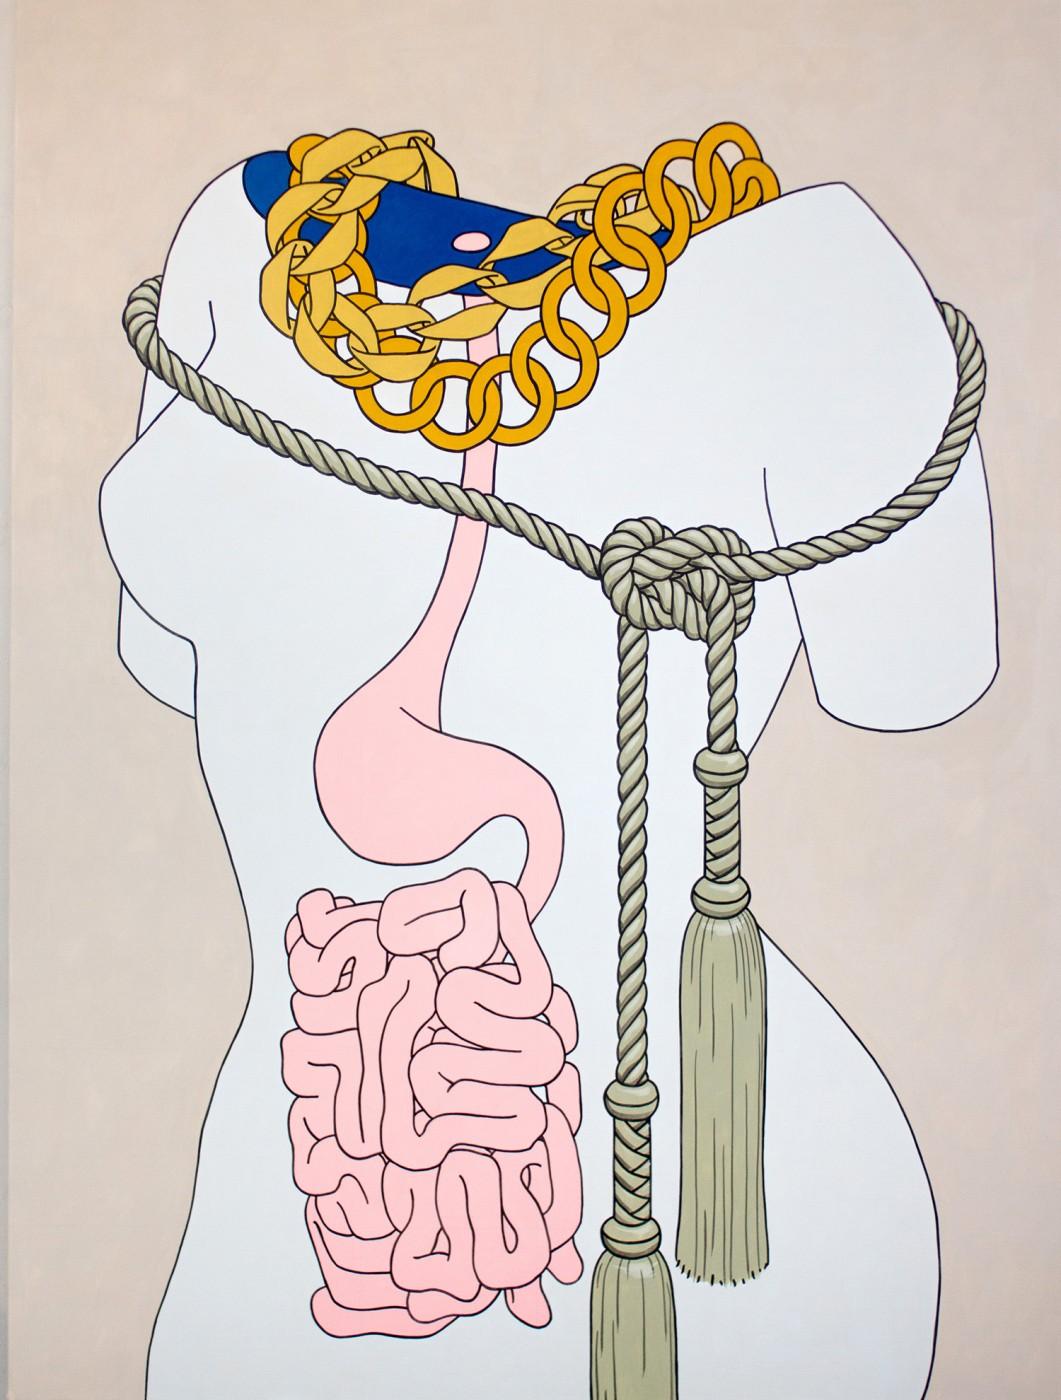 Caitlin Keogh, Intestine and Tassels , 2015, Acrylic on canvas, 84 x 63 in / 213.4 x 160cm. http://bortolamigallery.com/artist/caitlin-keogh/works/